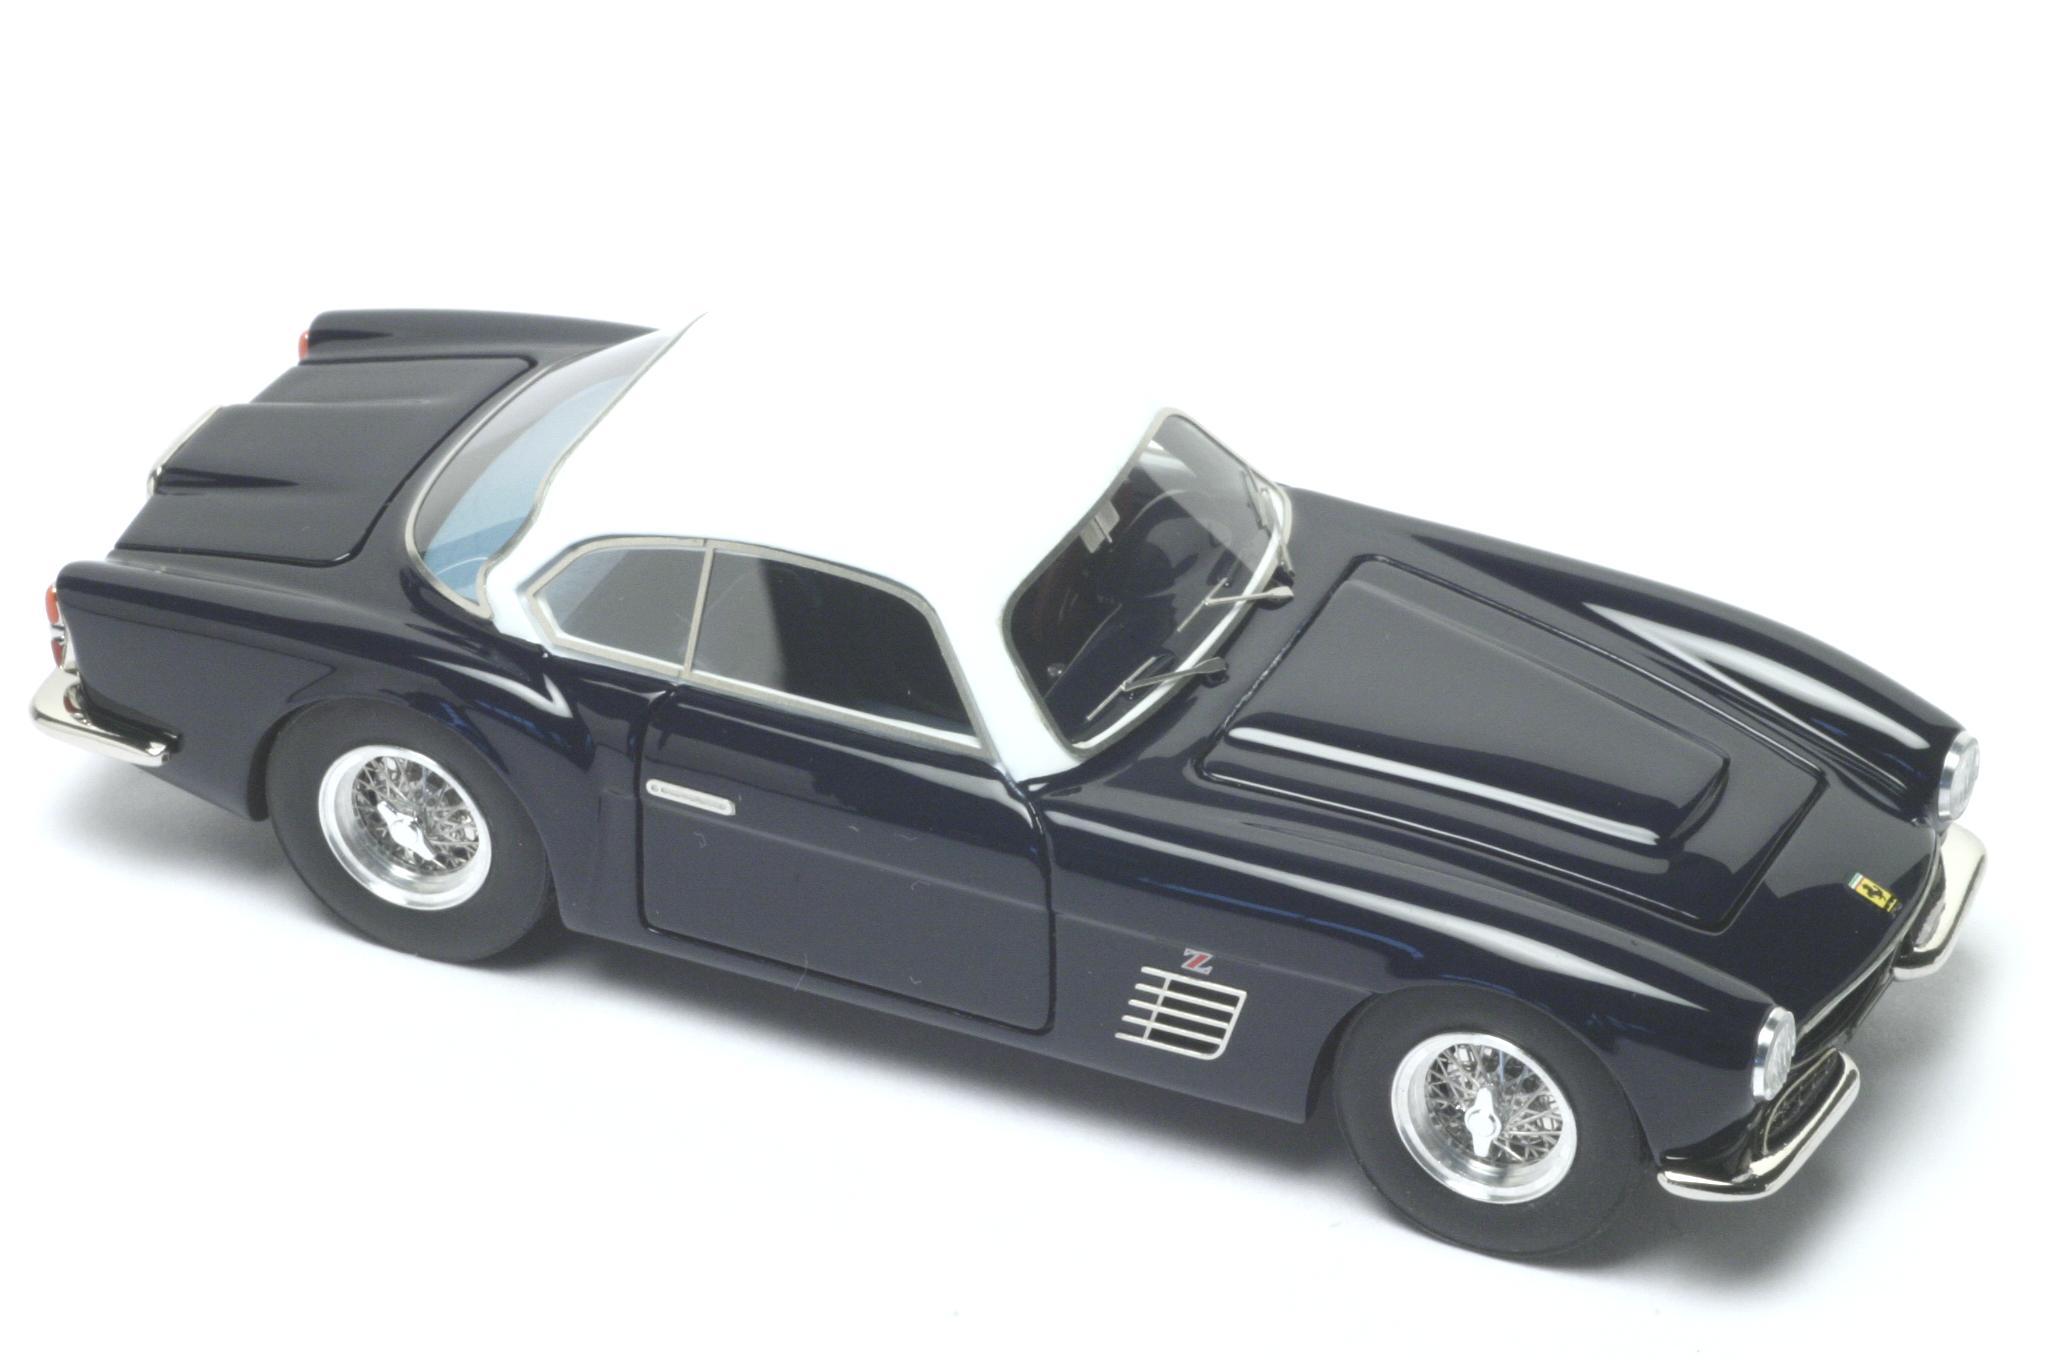 Ferrari Model Cars >> BBR Models: 1957 Ferrari 250 Zagato GT - Blue/ White (BBR80A) in 1:43 scale - mDiecast